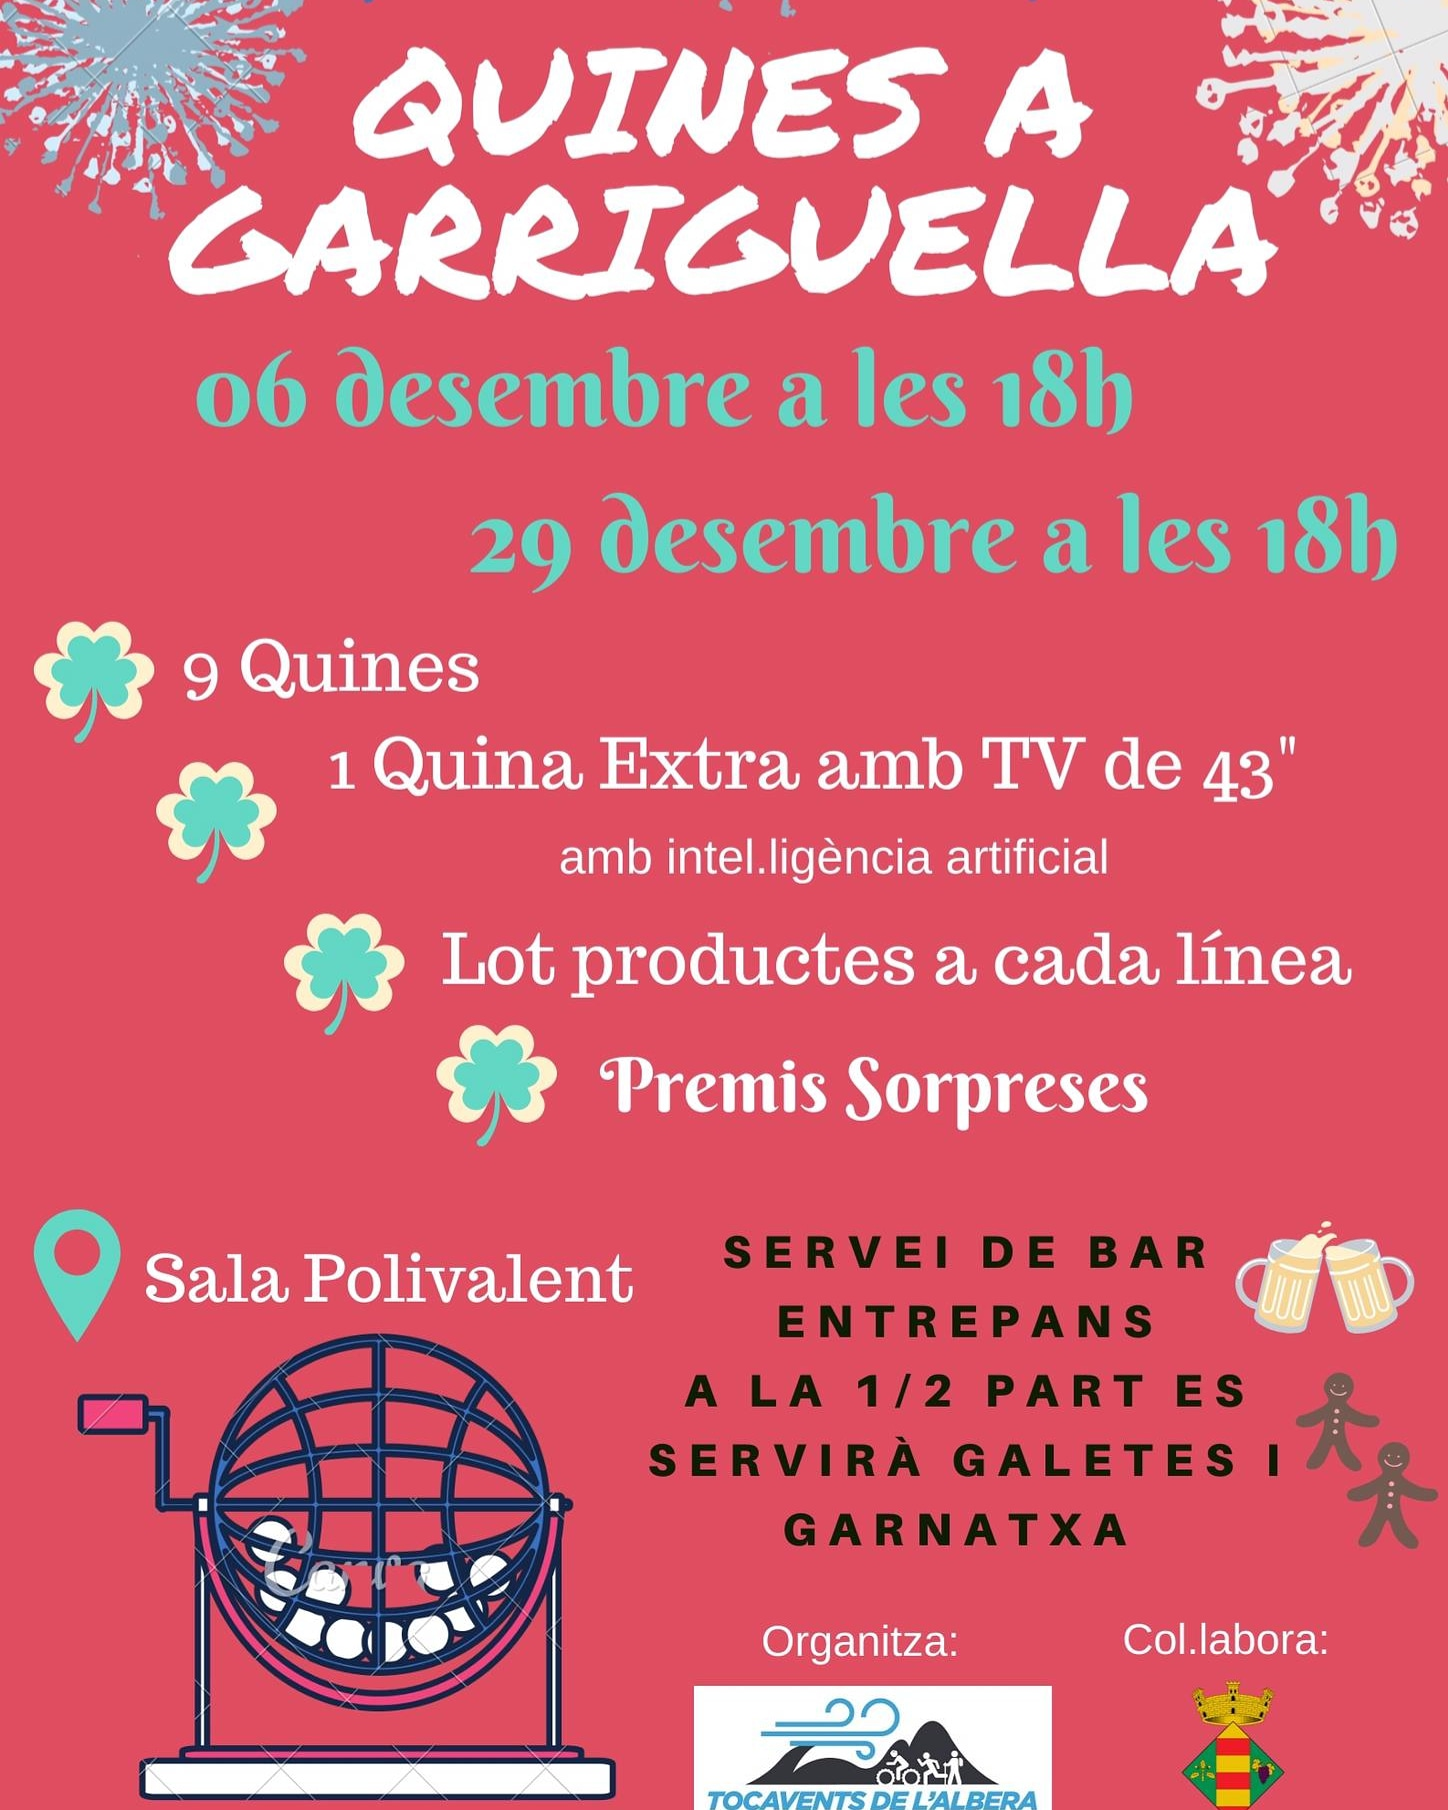 Quines a Garriguella